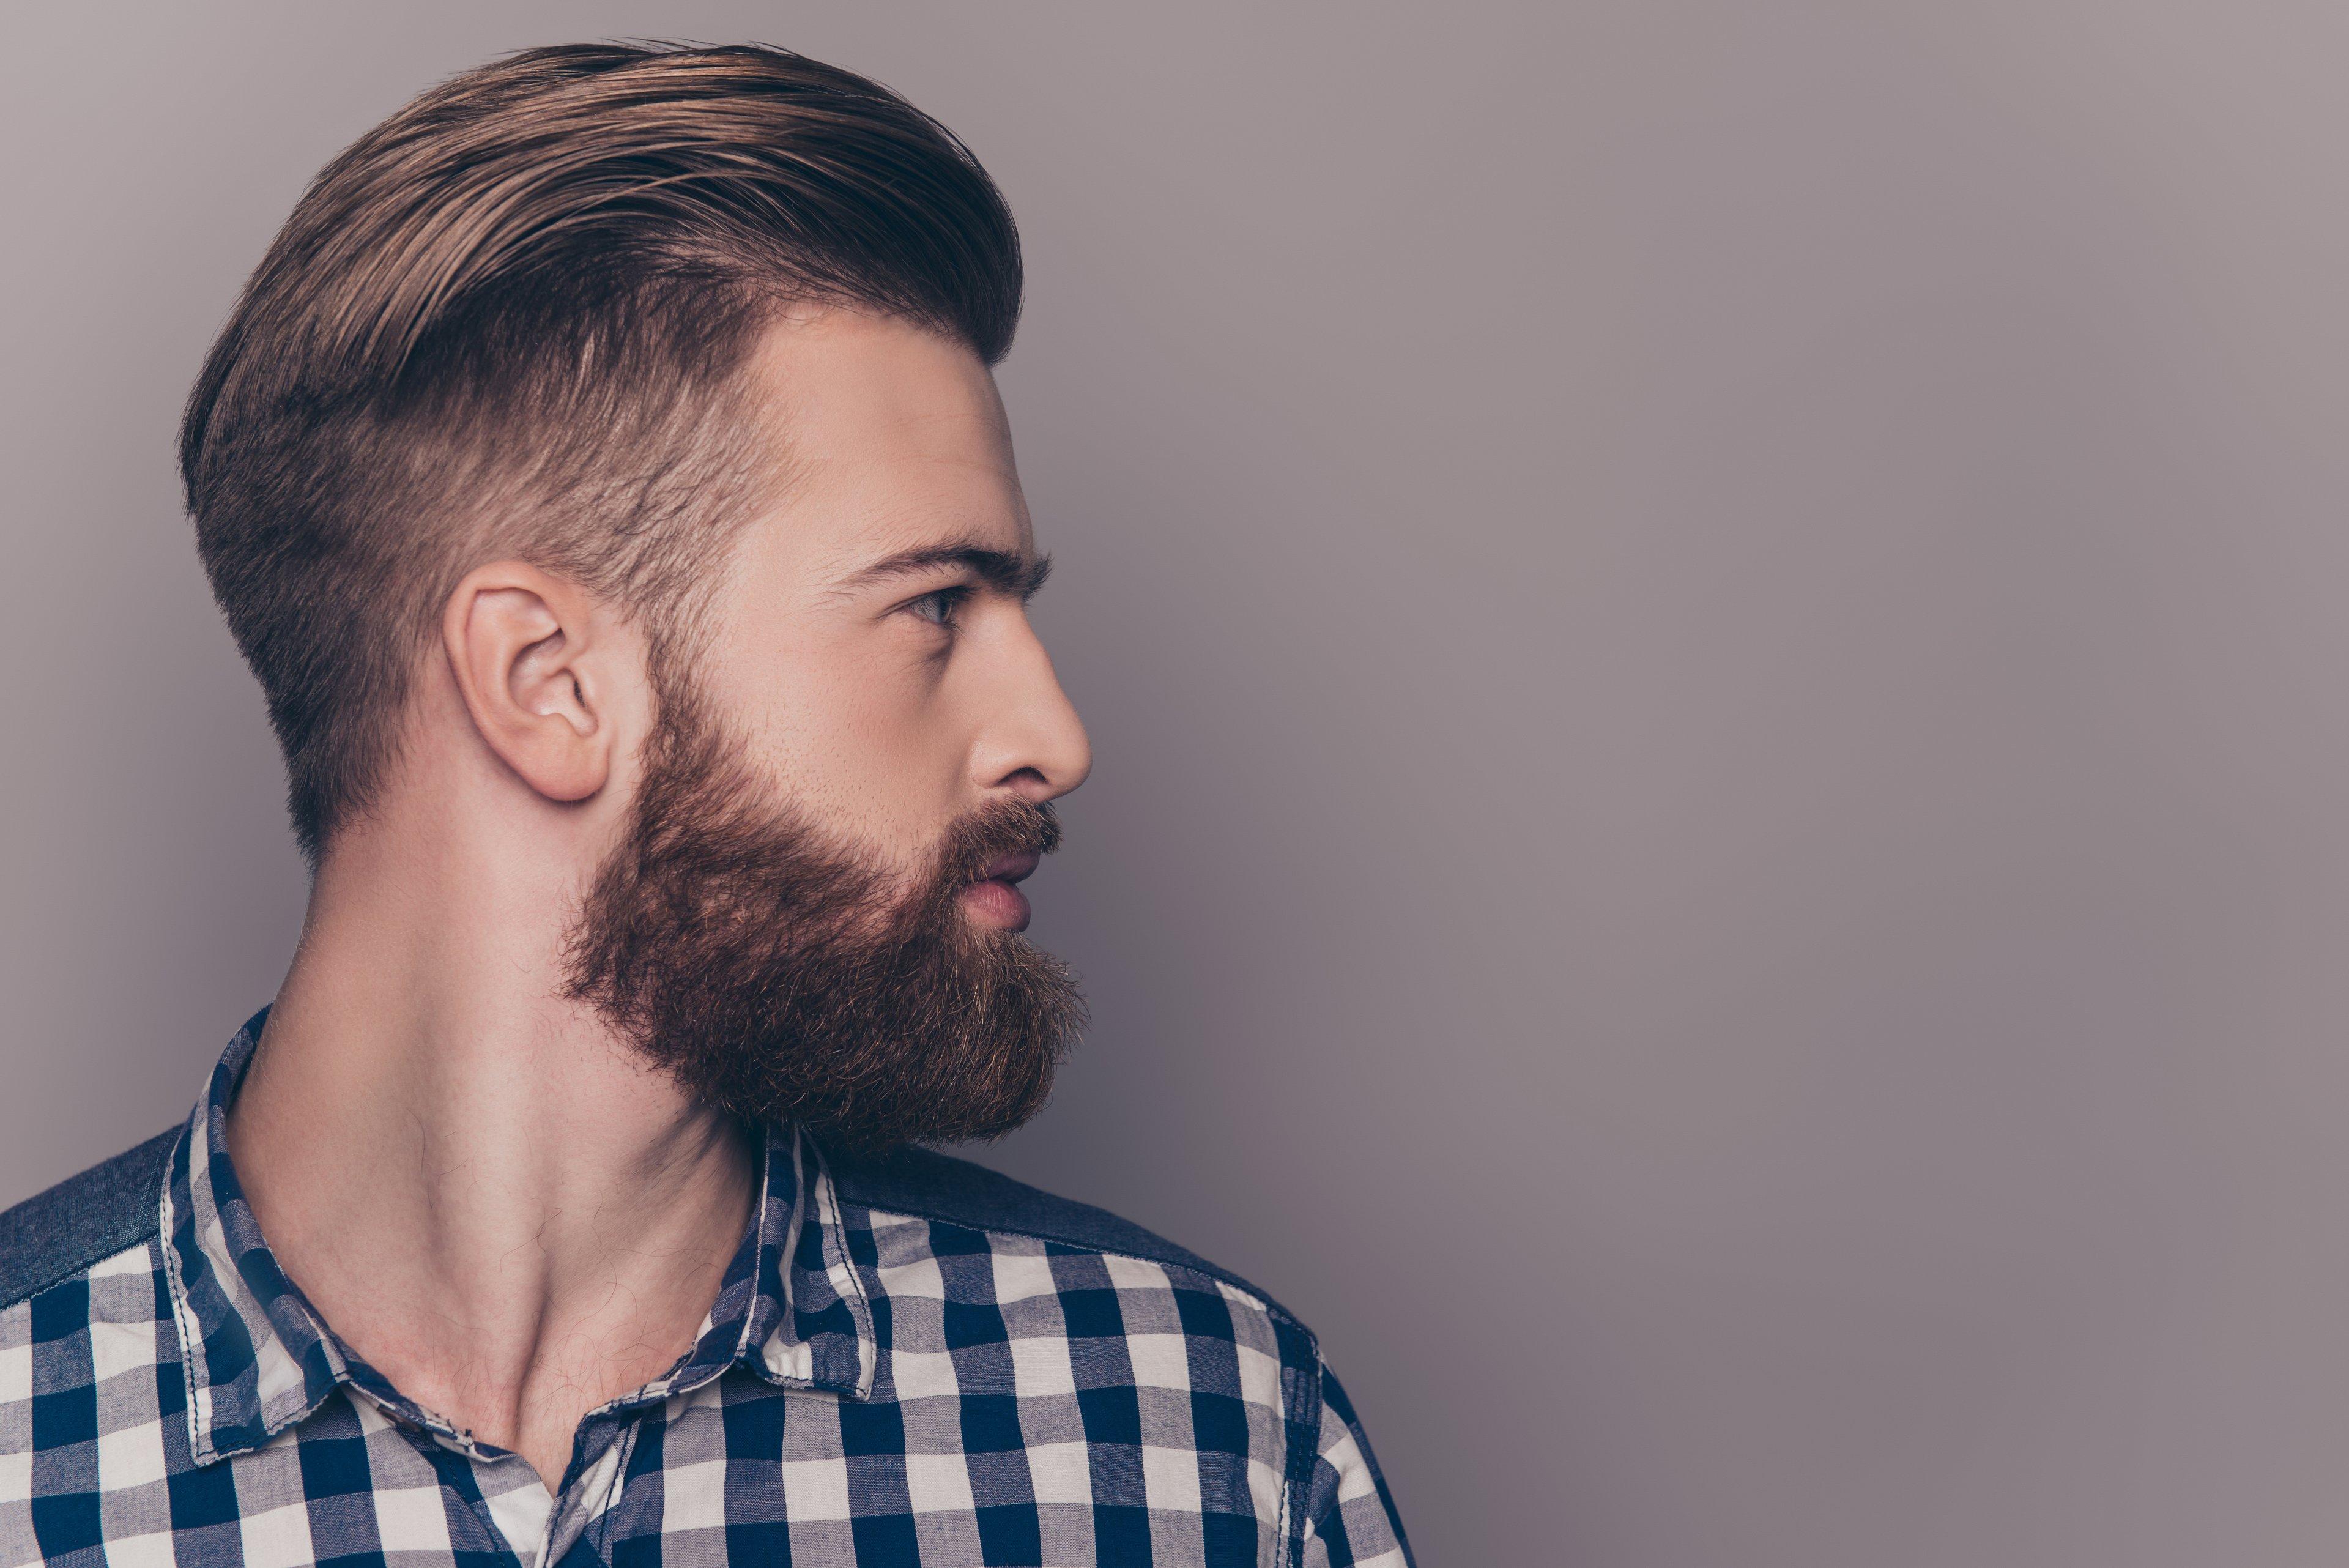 Académie de coiffure - Groupe Silvya Terrade